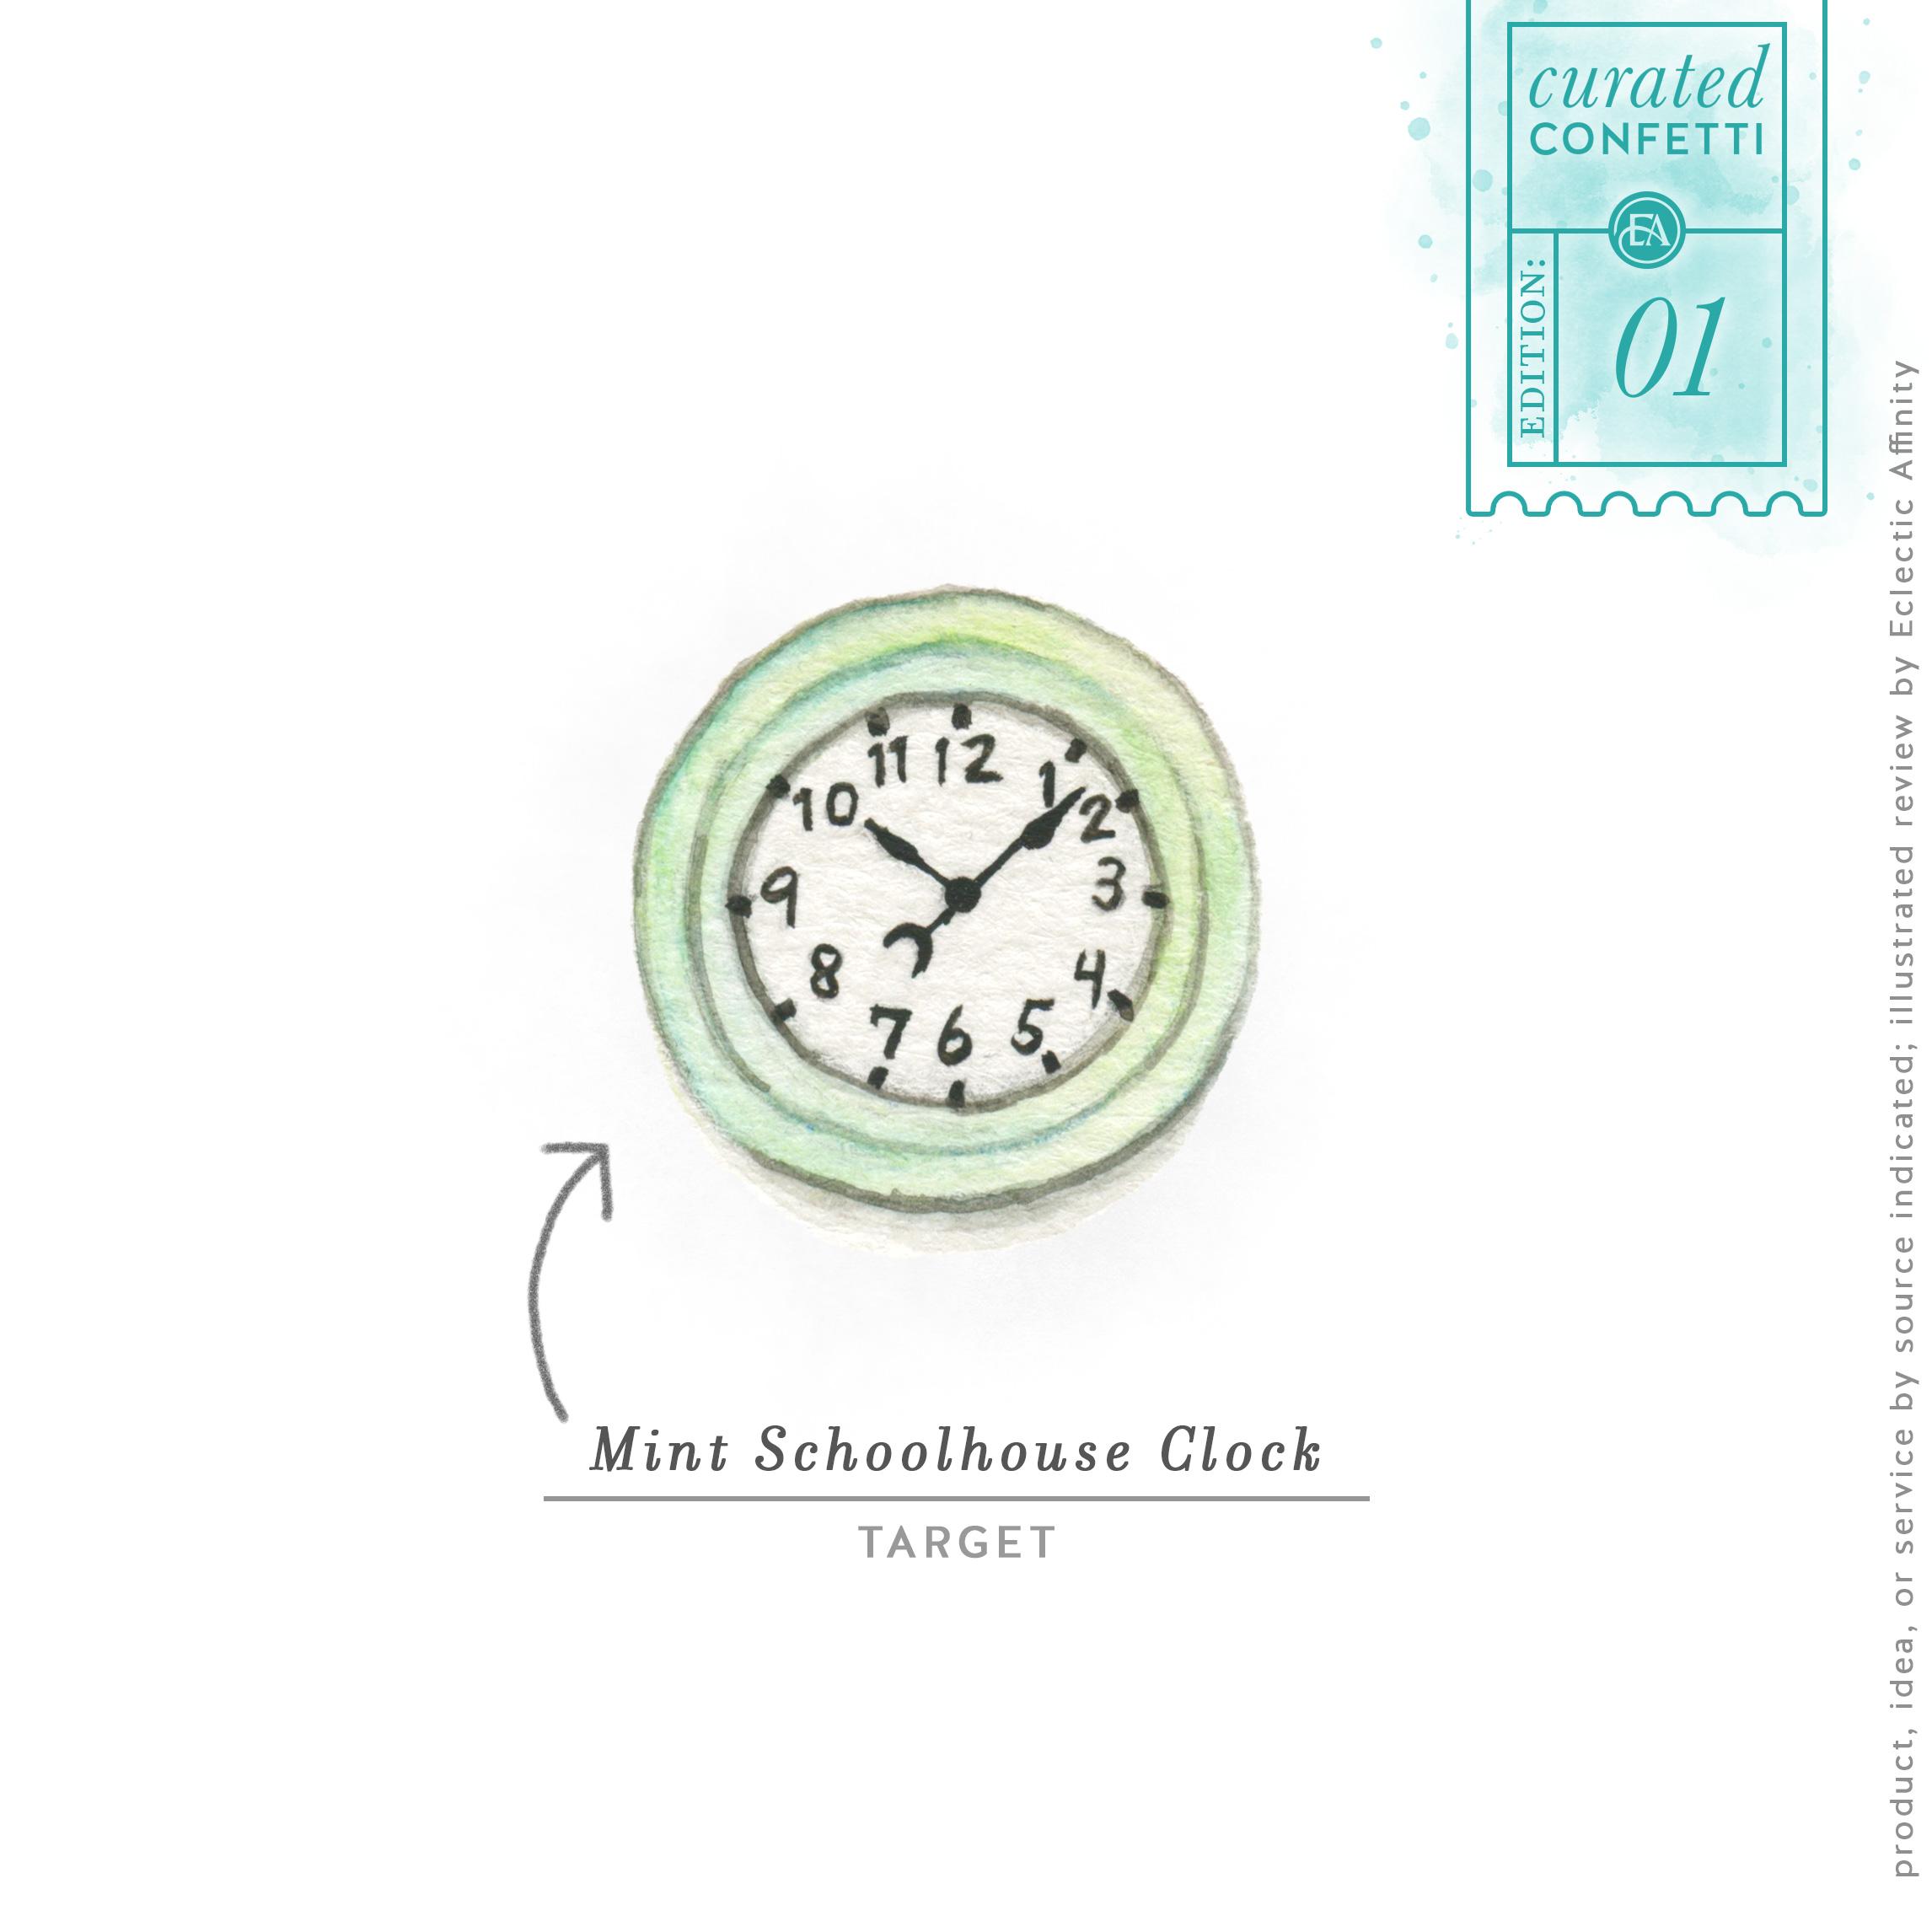 Mint Schoolhouse Clock